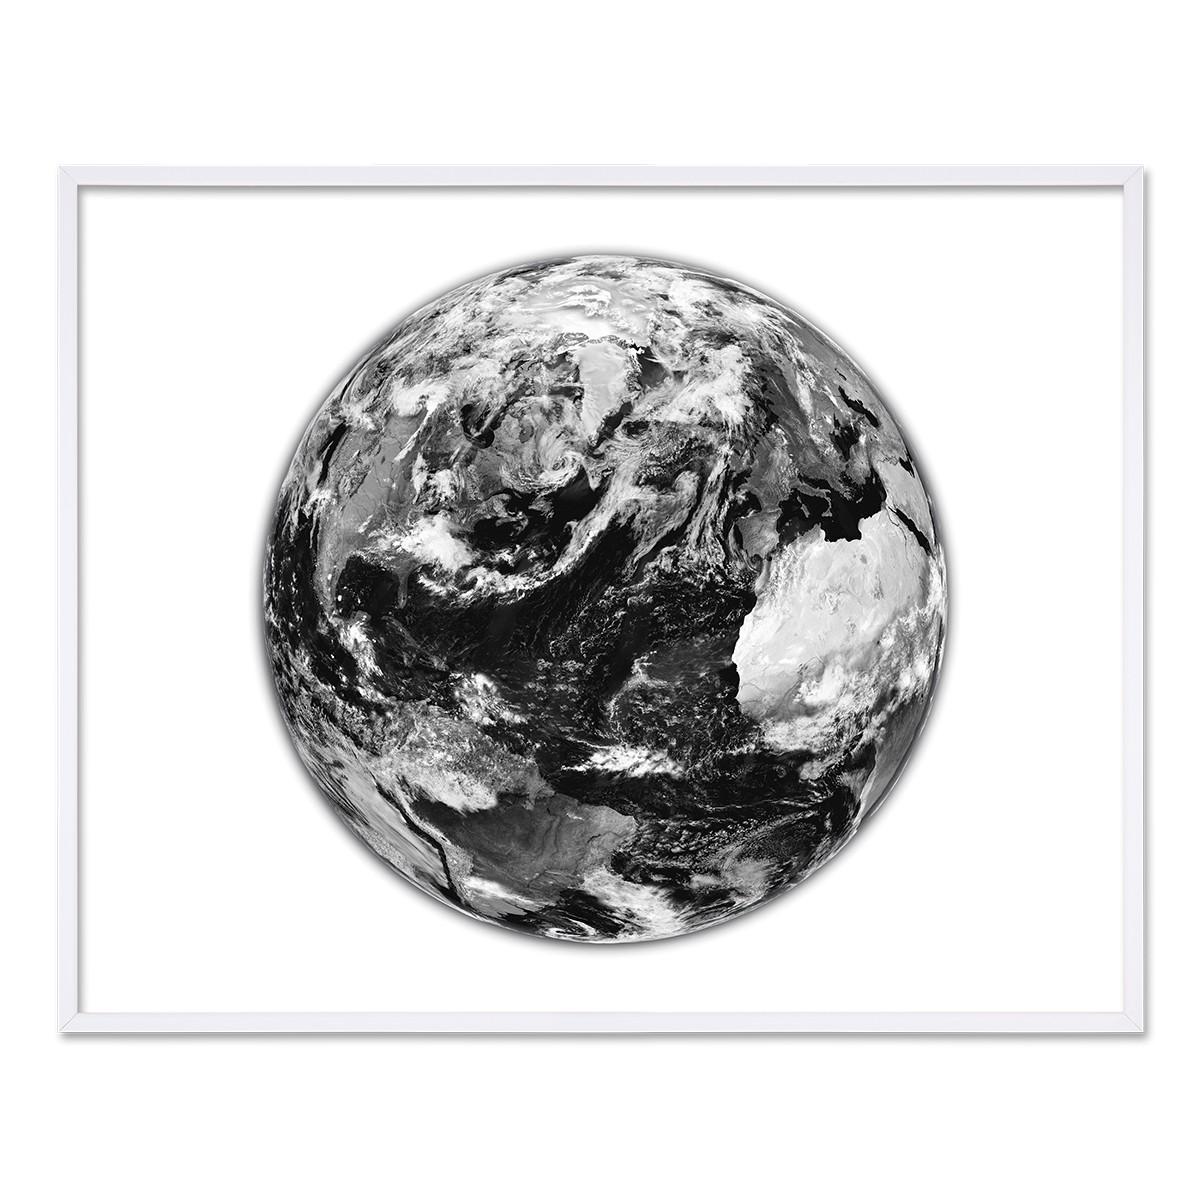 poster mit bilderrahmen weiss 39 earth 39 40x50 cm schwarz weiss motiv erde welt rahmen gr e 40x50 cm. Black Bedroom Furniture Sets. Home Design Ideas